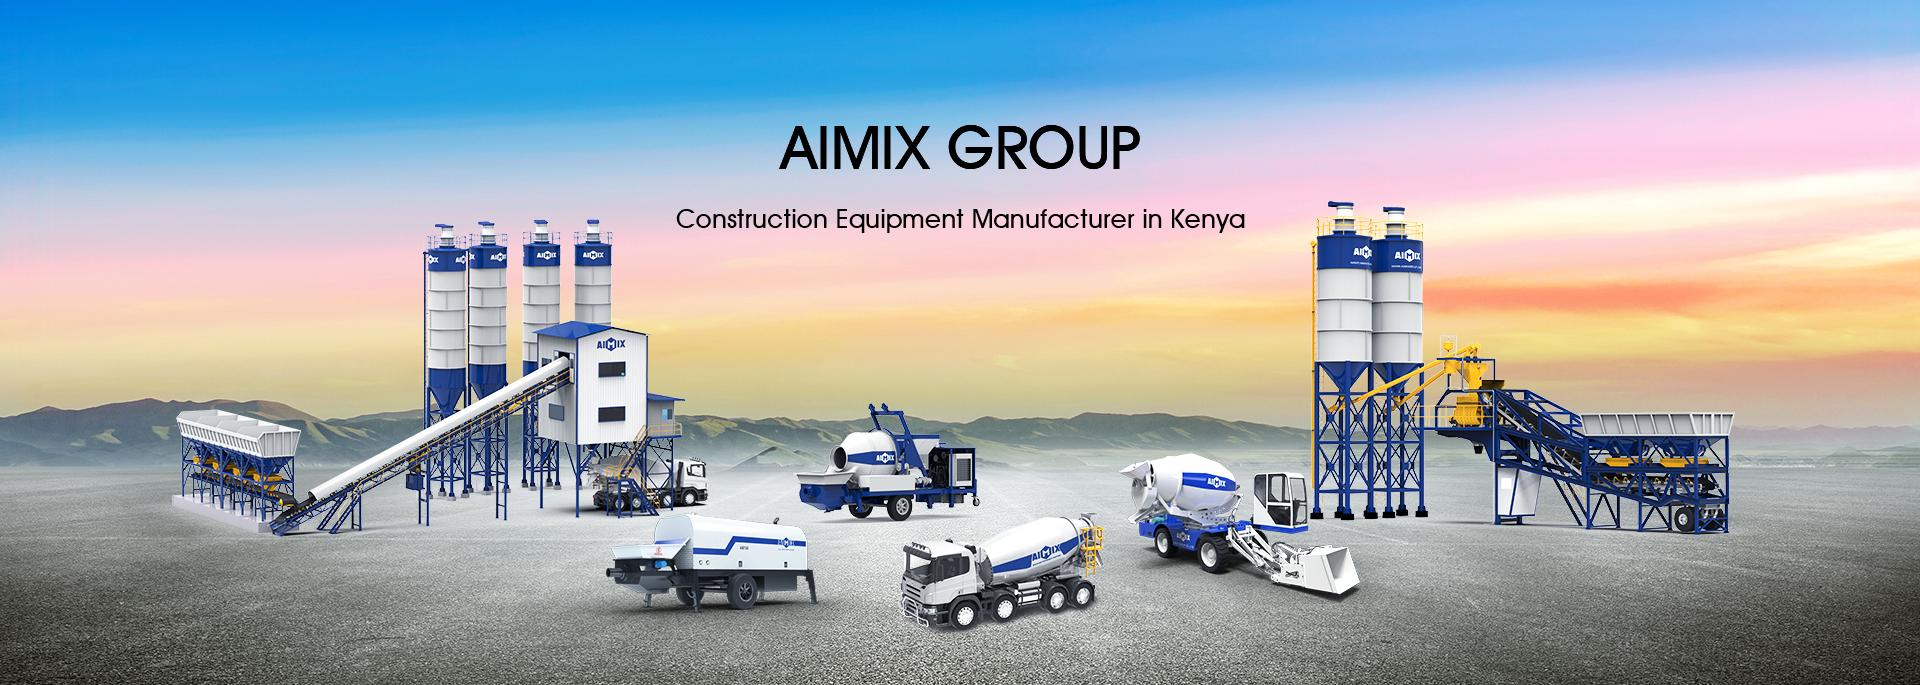 AIMIX In Kenya